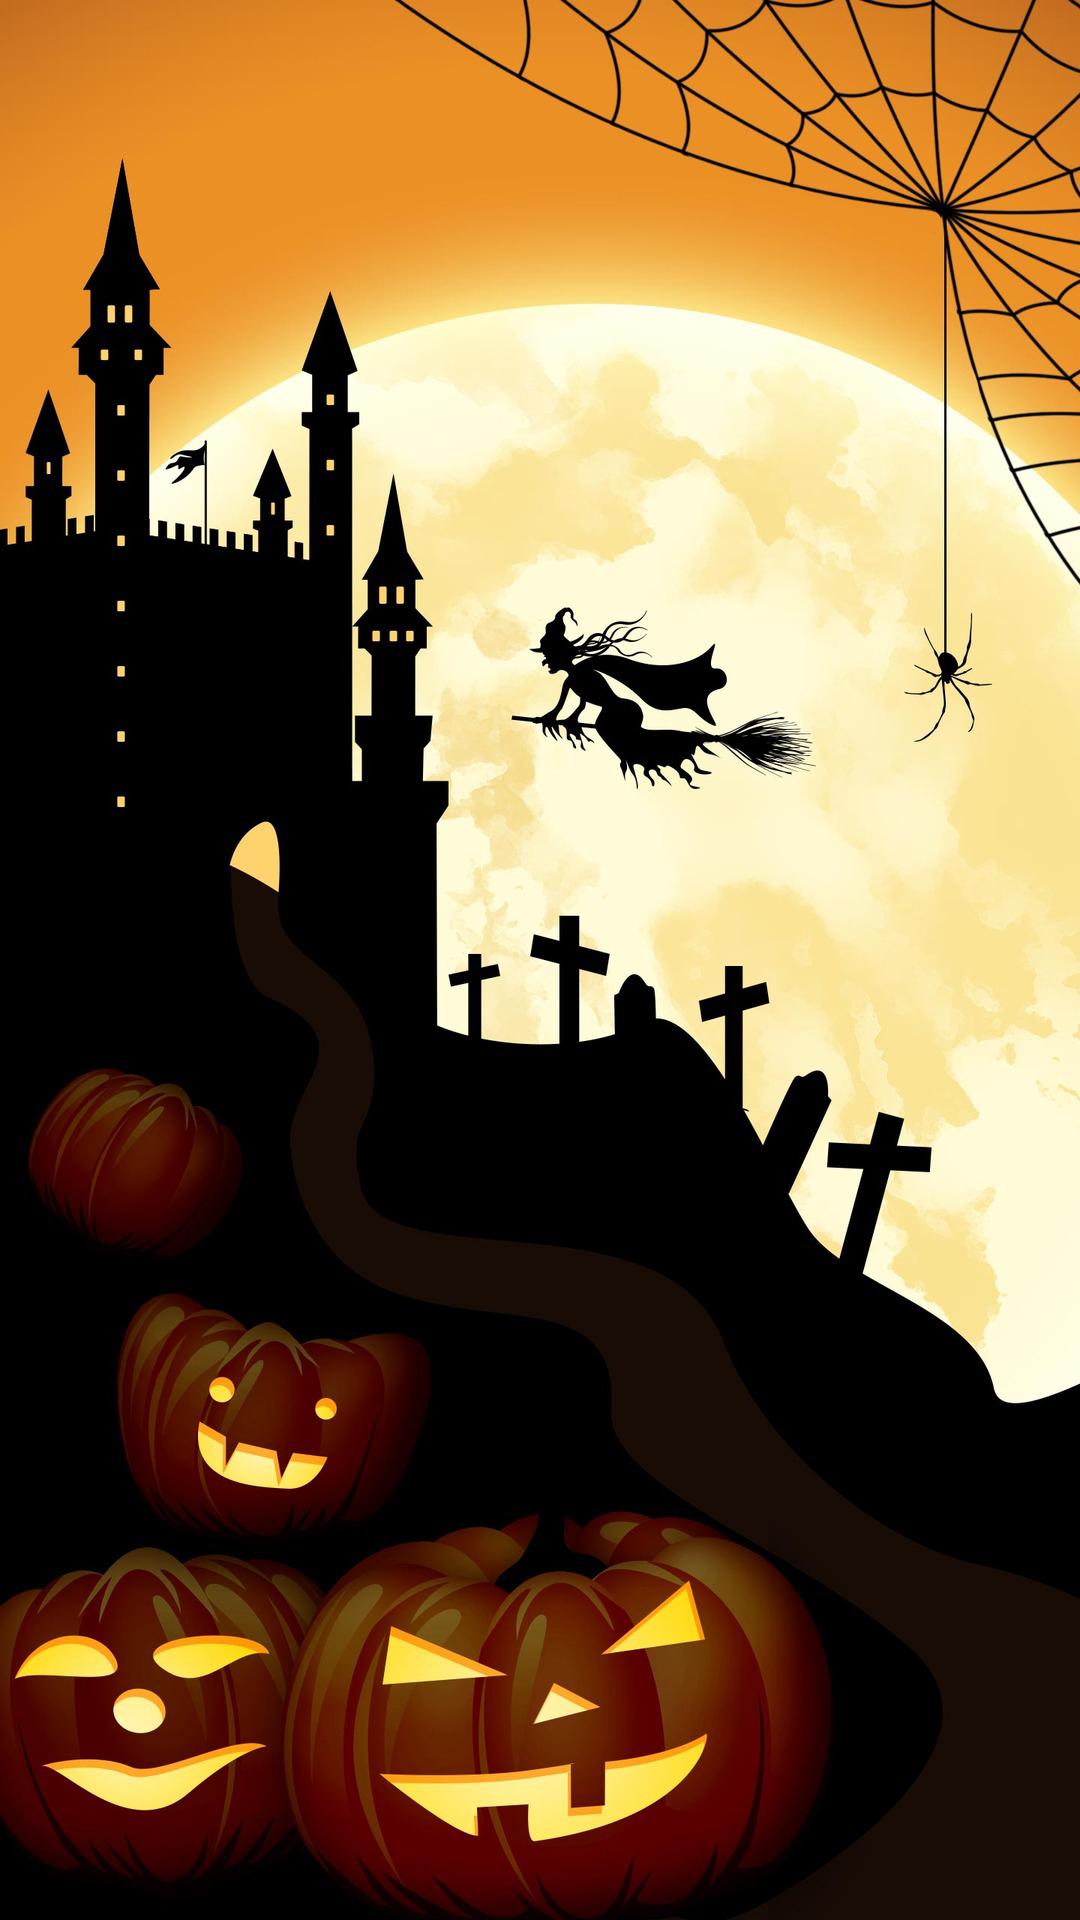 Halloween wallpapers iphone y android, fondos de pantalla halloween